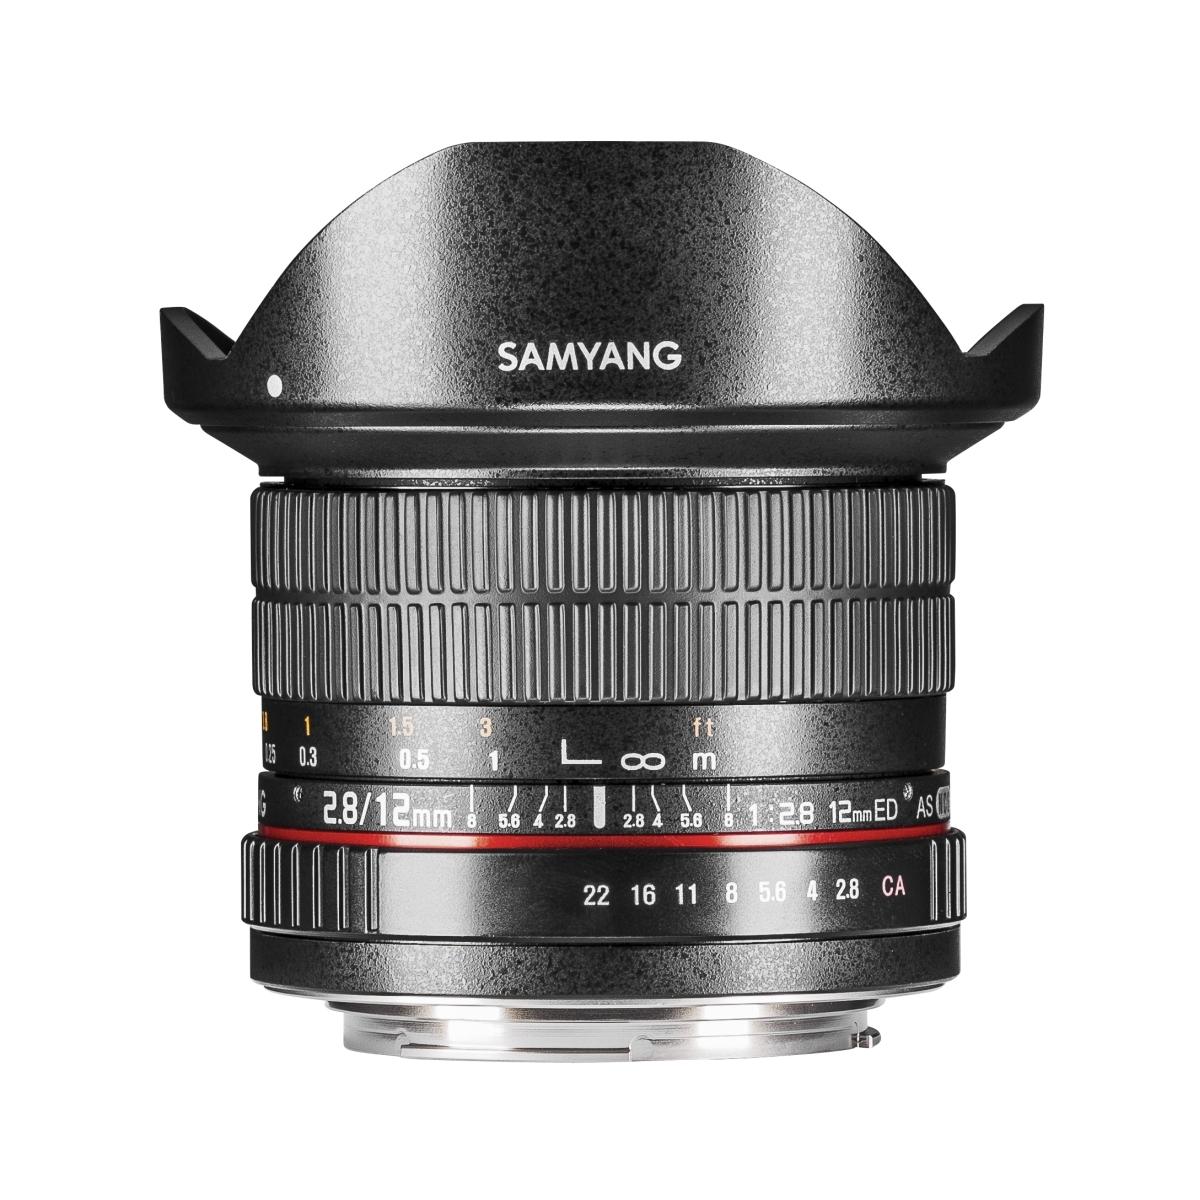 Samyang MF 12 mm 1:2,8 Fisheye für Canon EF-M